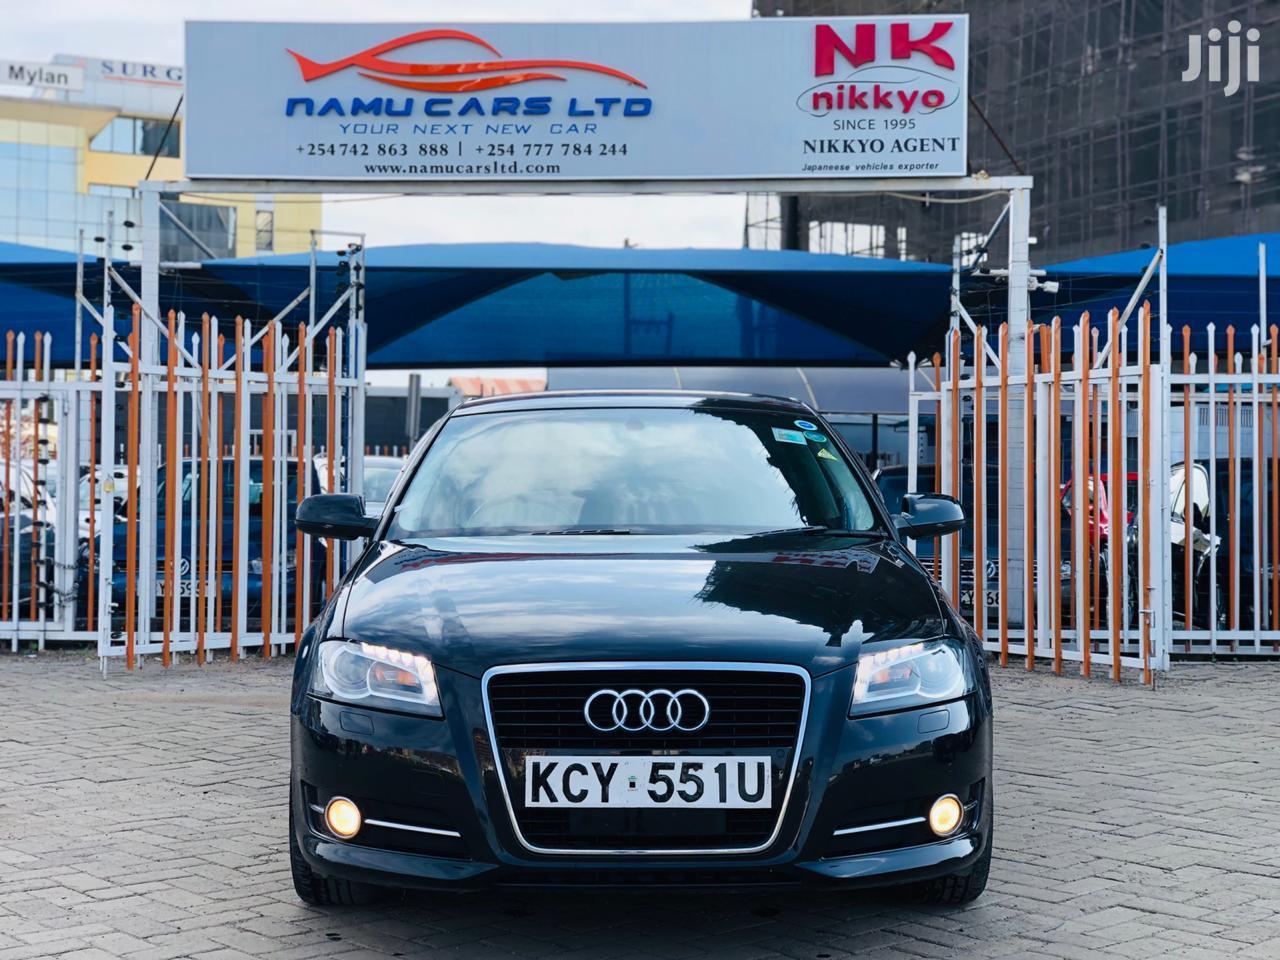 Audi A3 2013 Black | Cars for sale in Nairobi South, Nairobi, Kenya